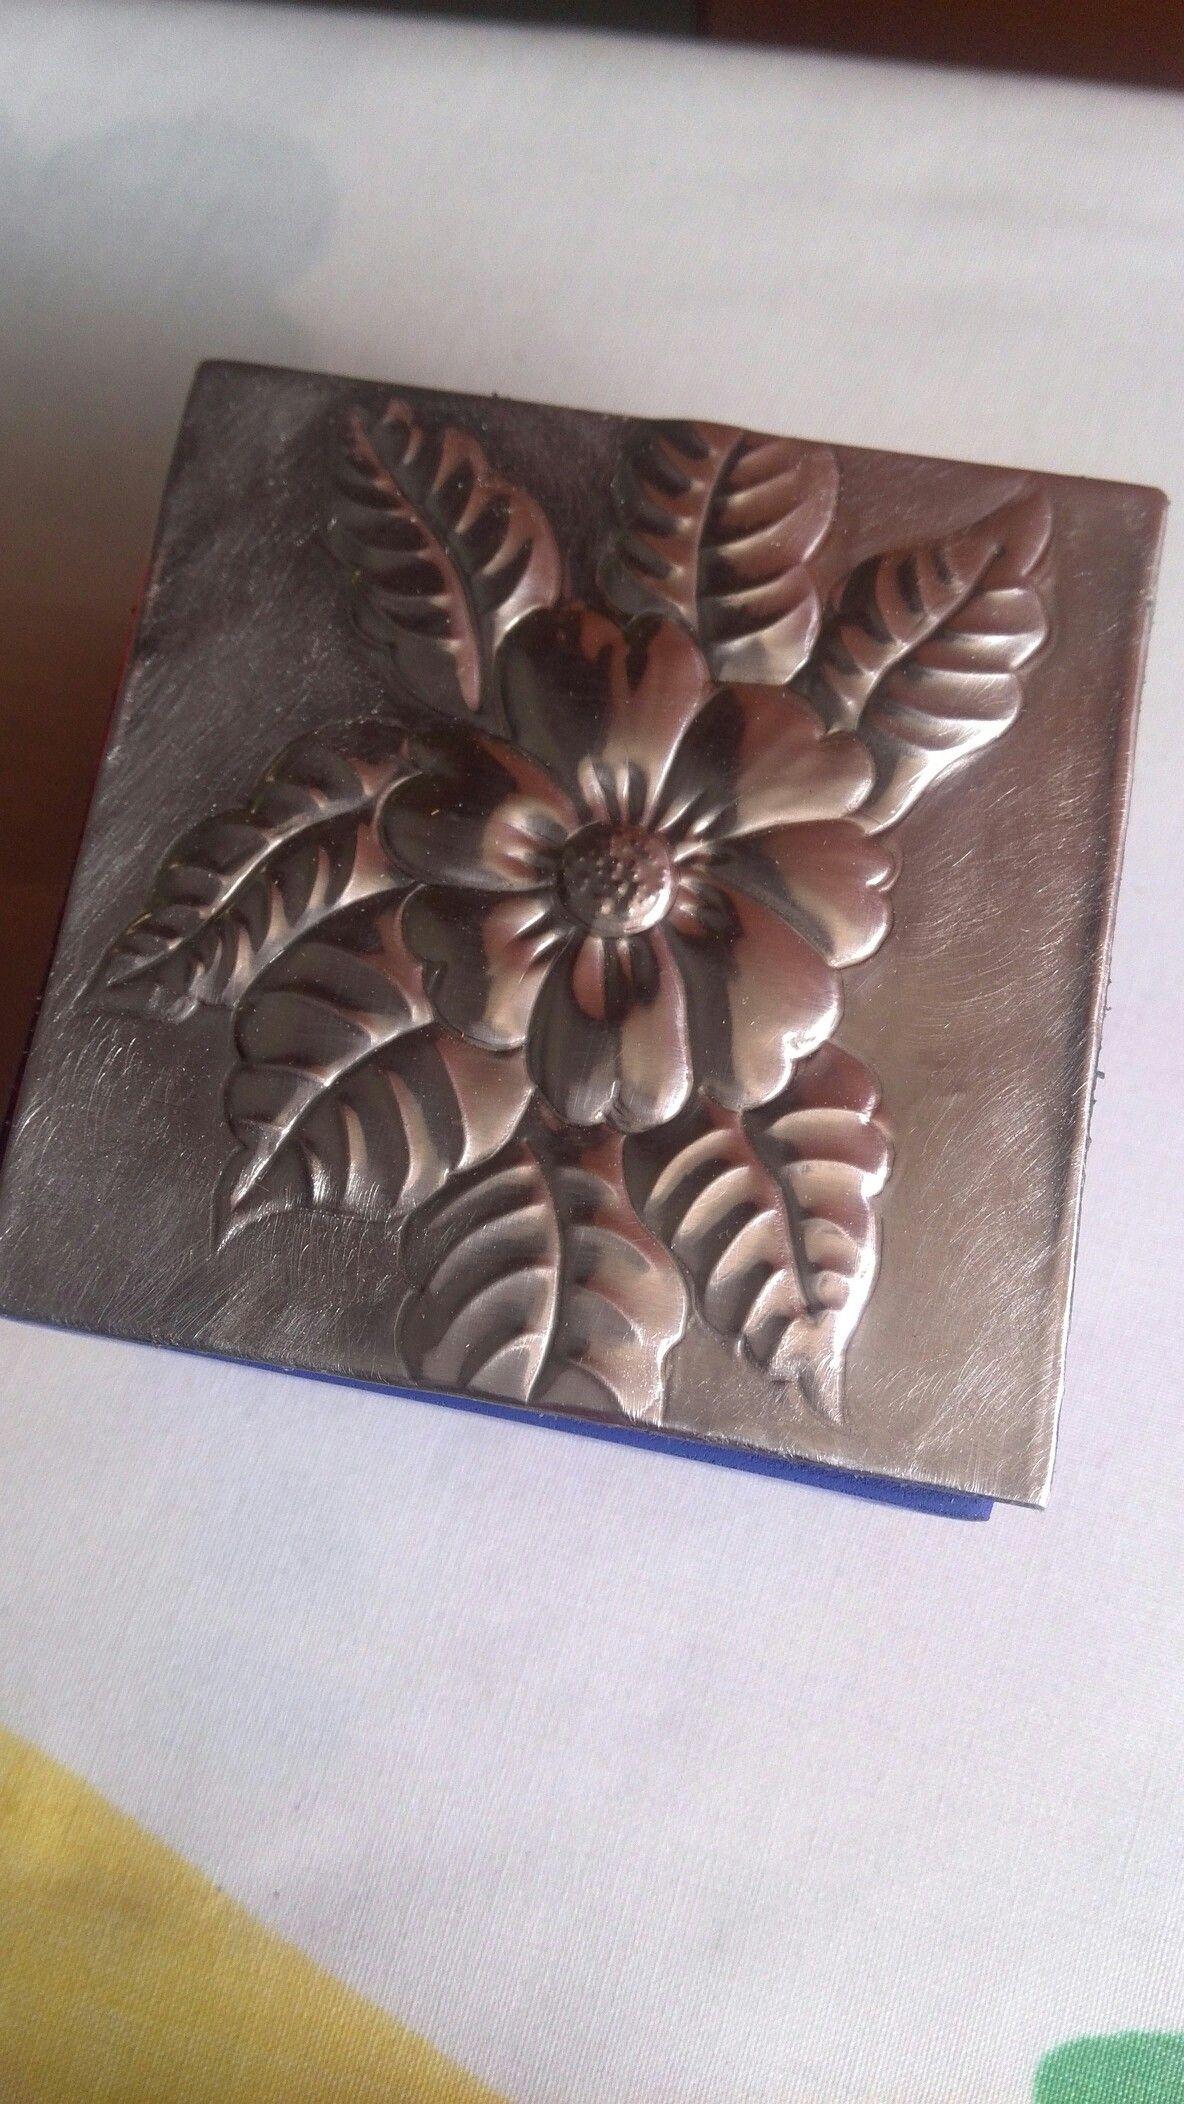 Caja Repujada En Aluminio Arte Cobre Arte De Hojalata Estano Arte Lamina